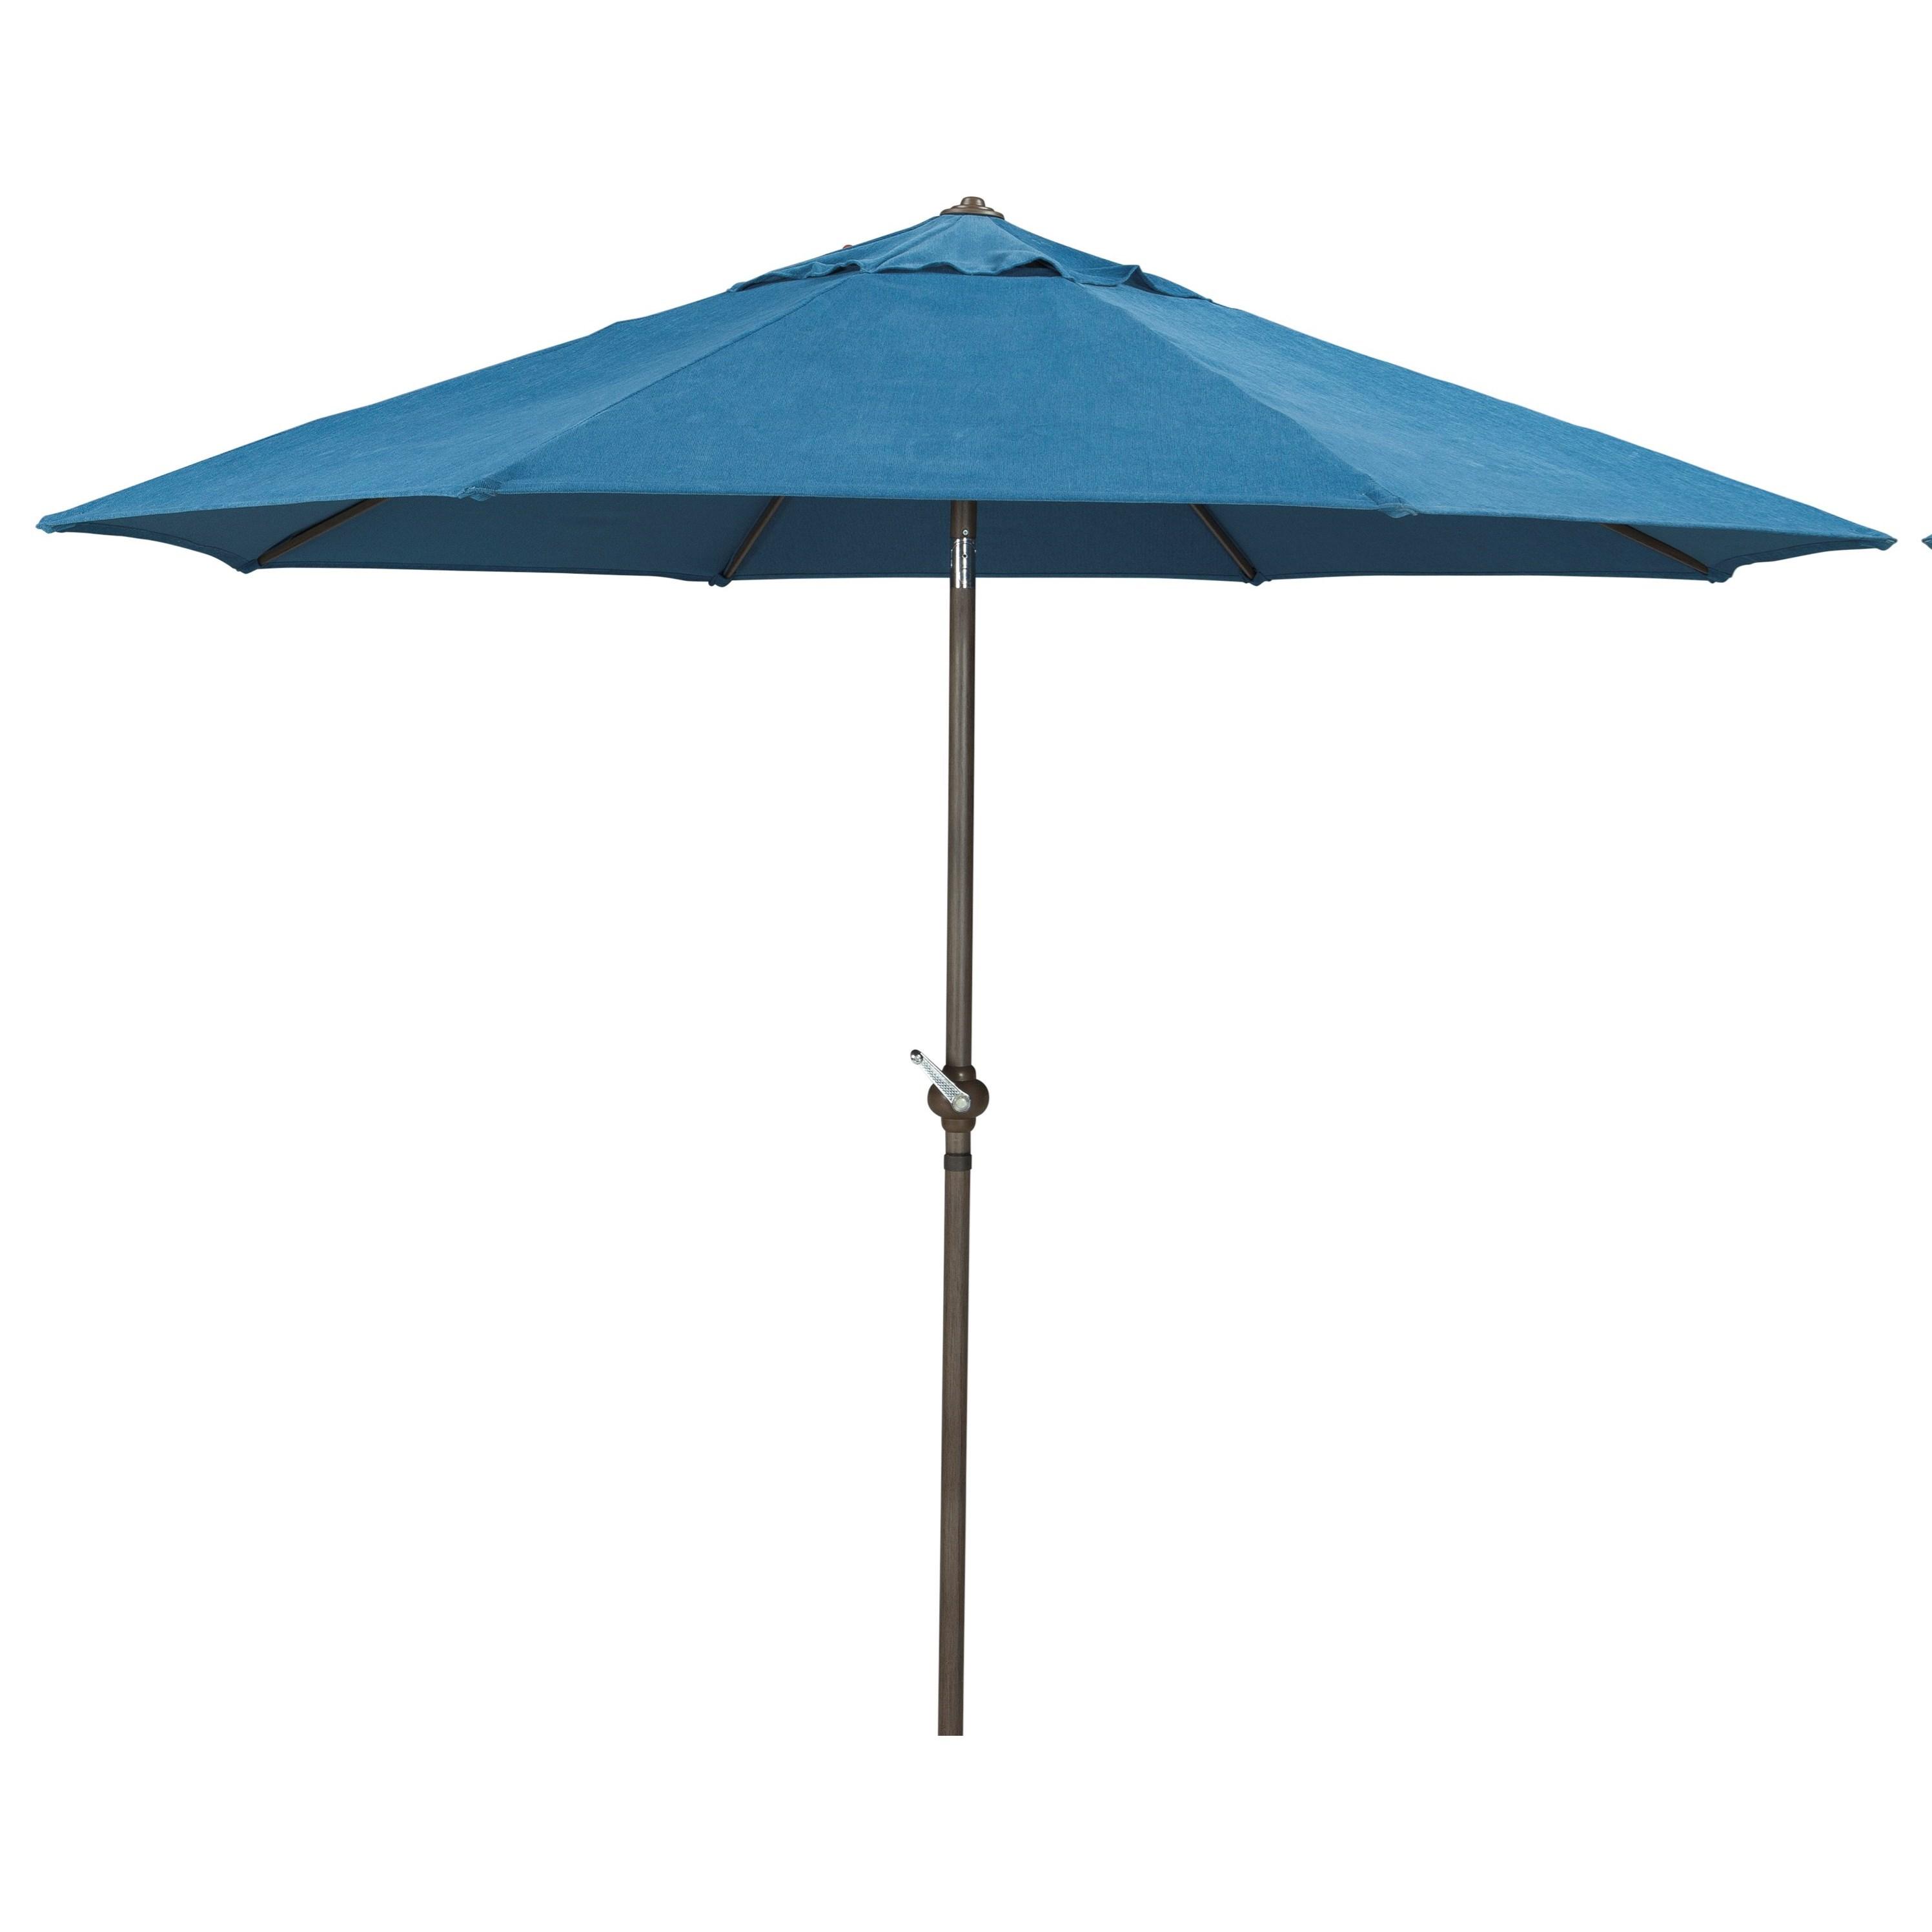 Ashley signature design umbrella accessories p000 983 for Architecture upbrella